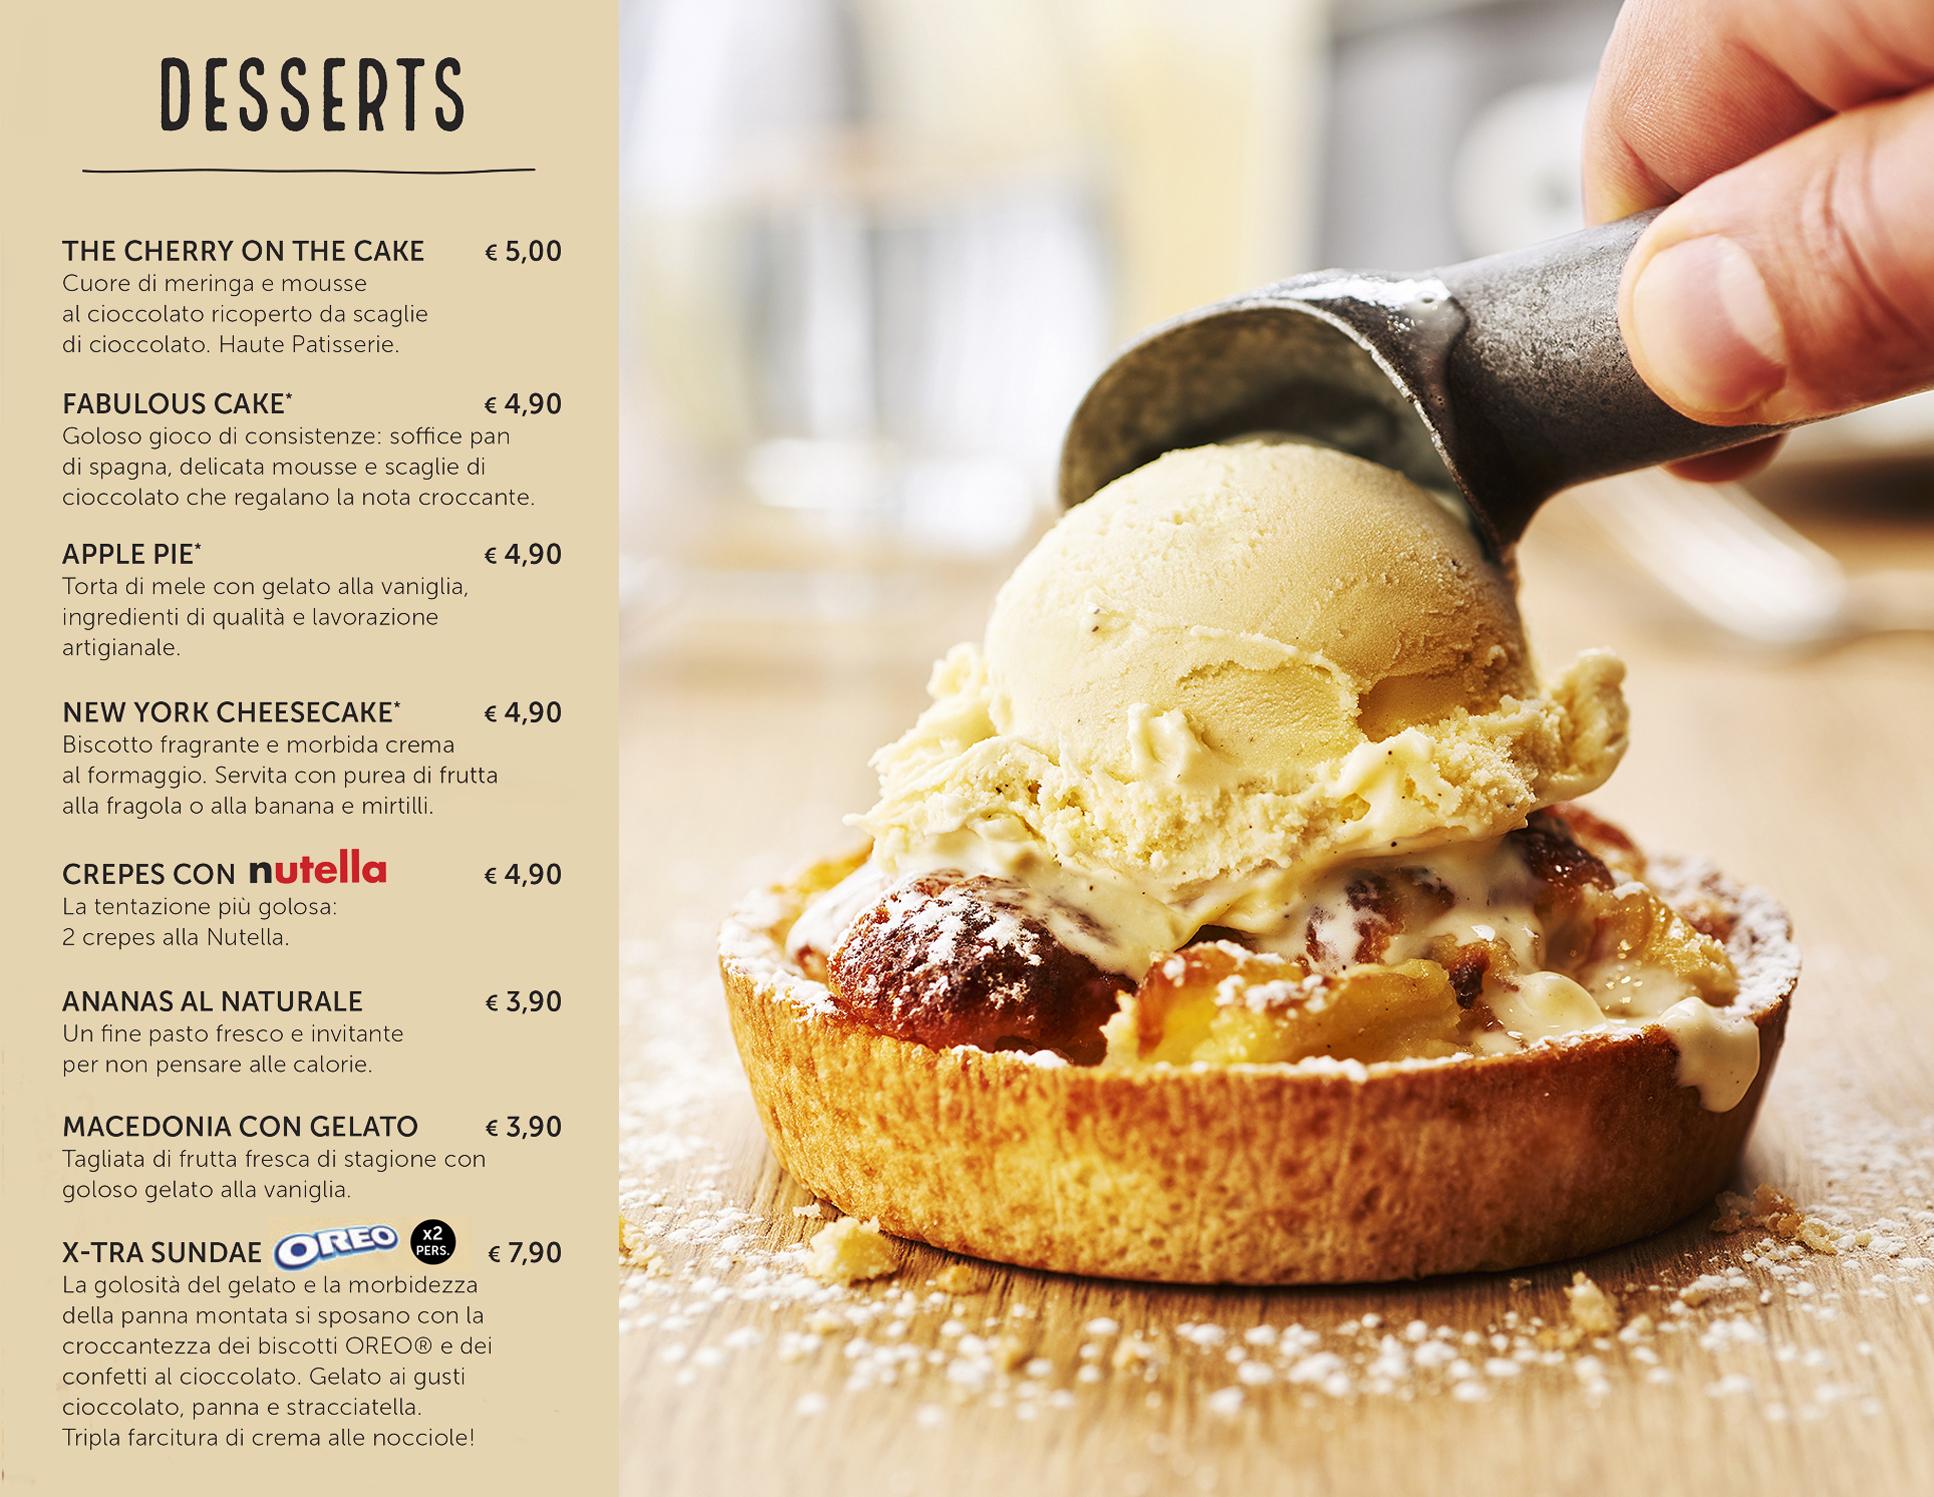 food-photographer-london-uk-england-united-kingdom-britain-photography-foodhall-hall-drink-steak-restaurant-apple-pie-ribs-medium-red-pink-rare-cooking-cooked-burgers-burger-grill-chicken-wine-beer-drinks-menu